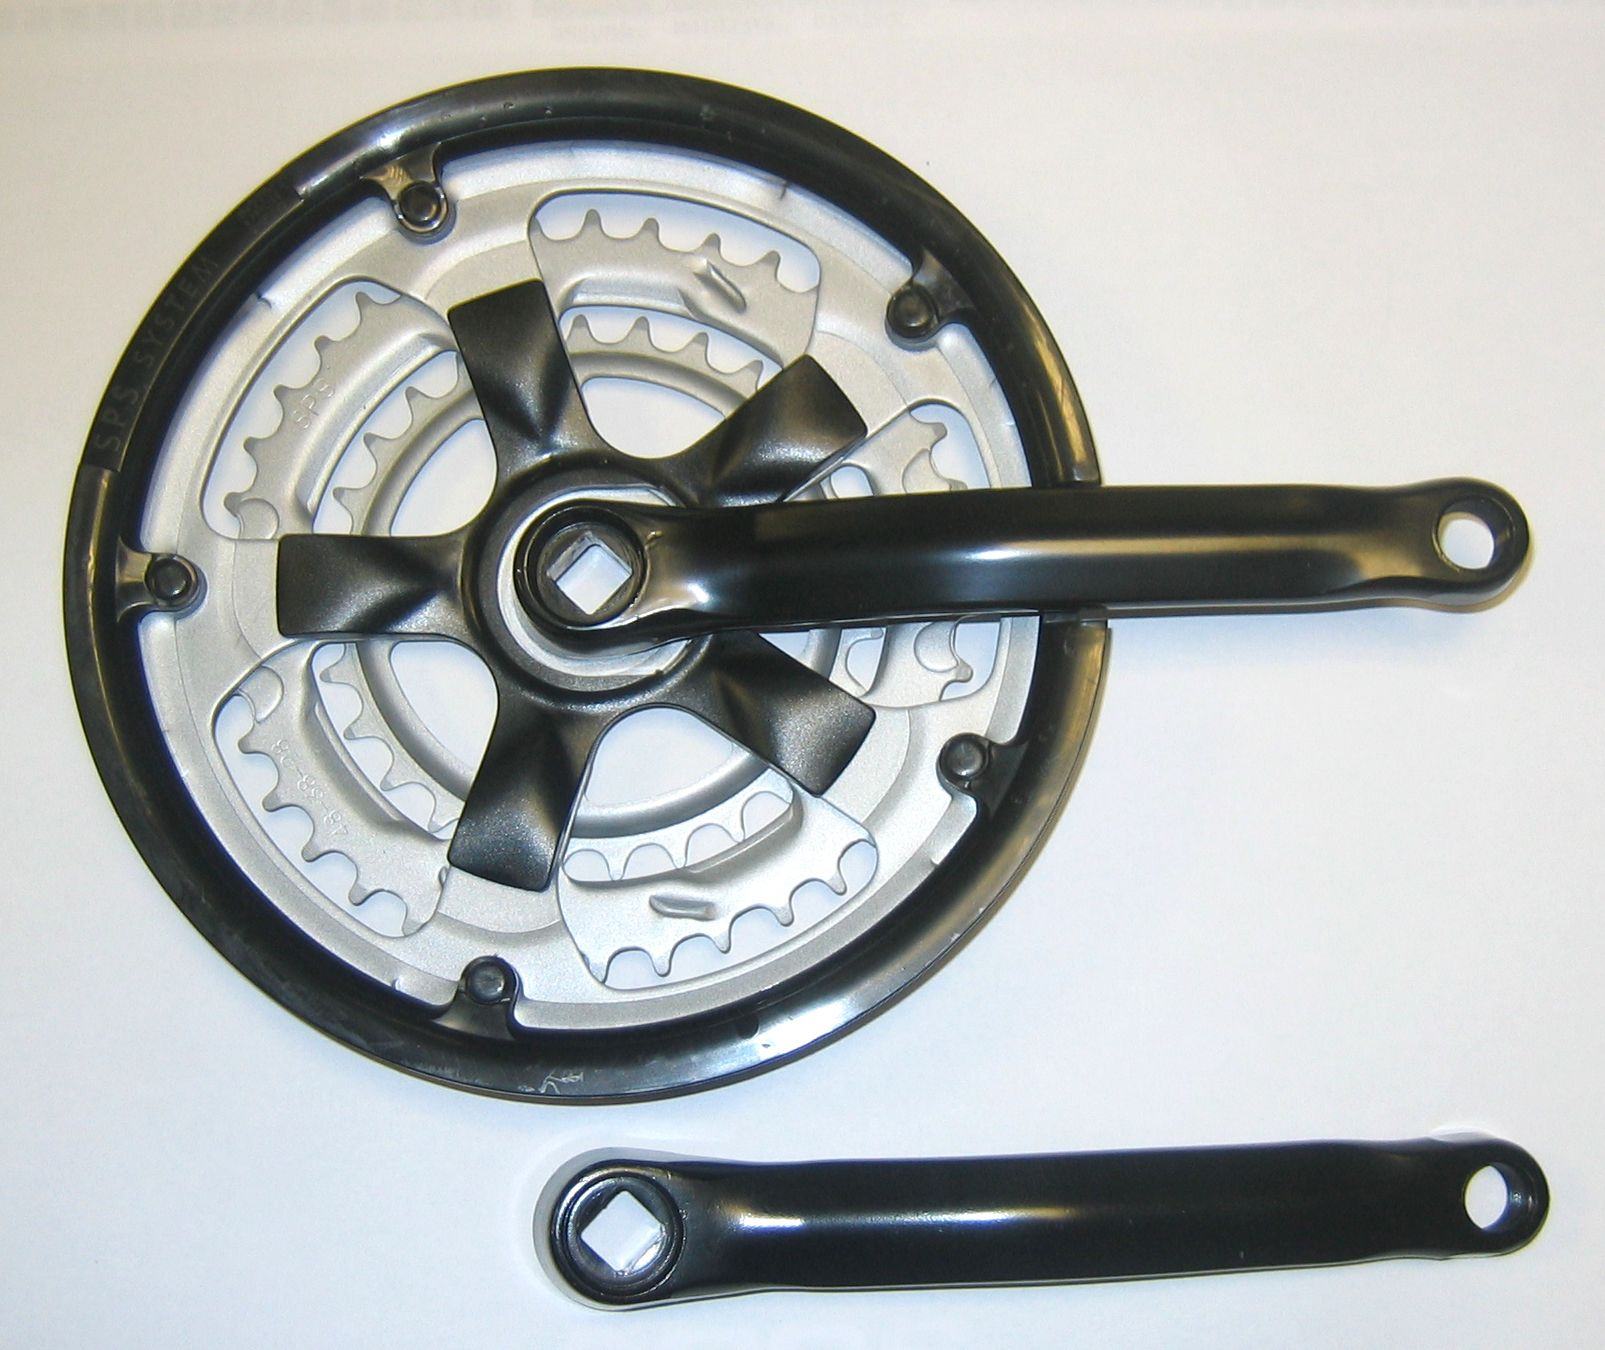 kettengarnitur (kettengarnitur)/Kette: Amar  959-K 48-38-28x170